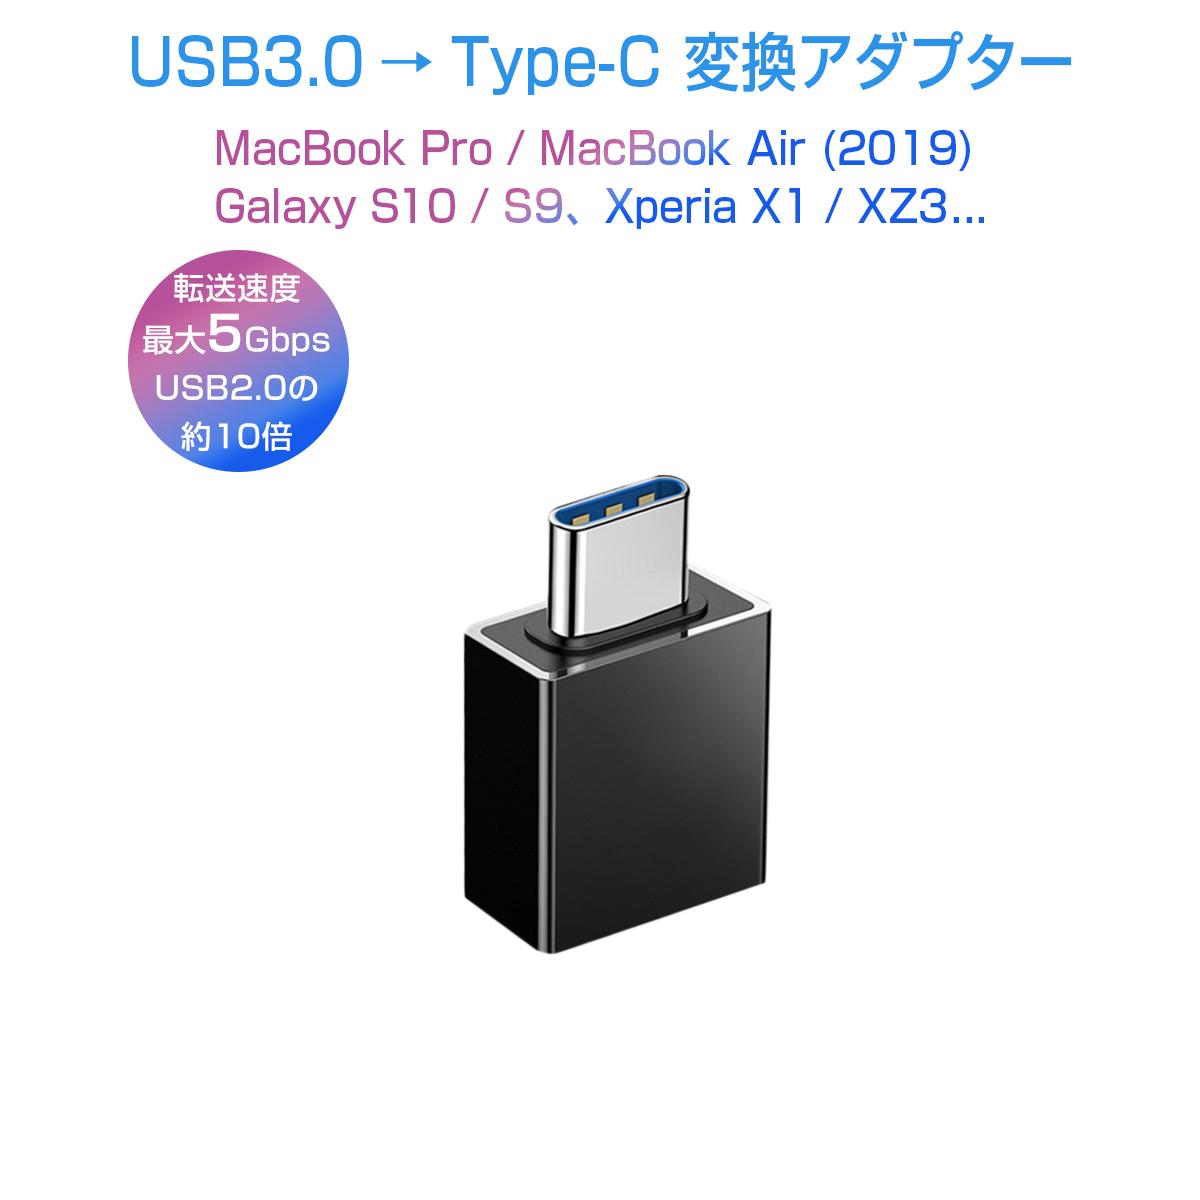 USB Type C USB 3.0 変換アダプター 黒 高速データ転送 5Gbps USB2.0の10倍の速度 MacBook Pro/Air 2019対応 iPad Xperia X1/XZ3 Galaxy S10/S9 他対応 変換コネクター SDM便送料無料 1ヶ月保証 K&M